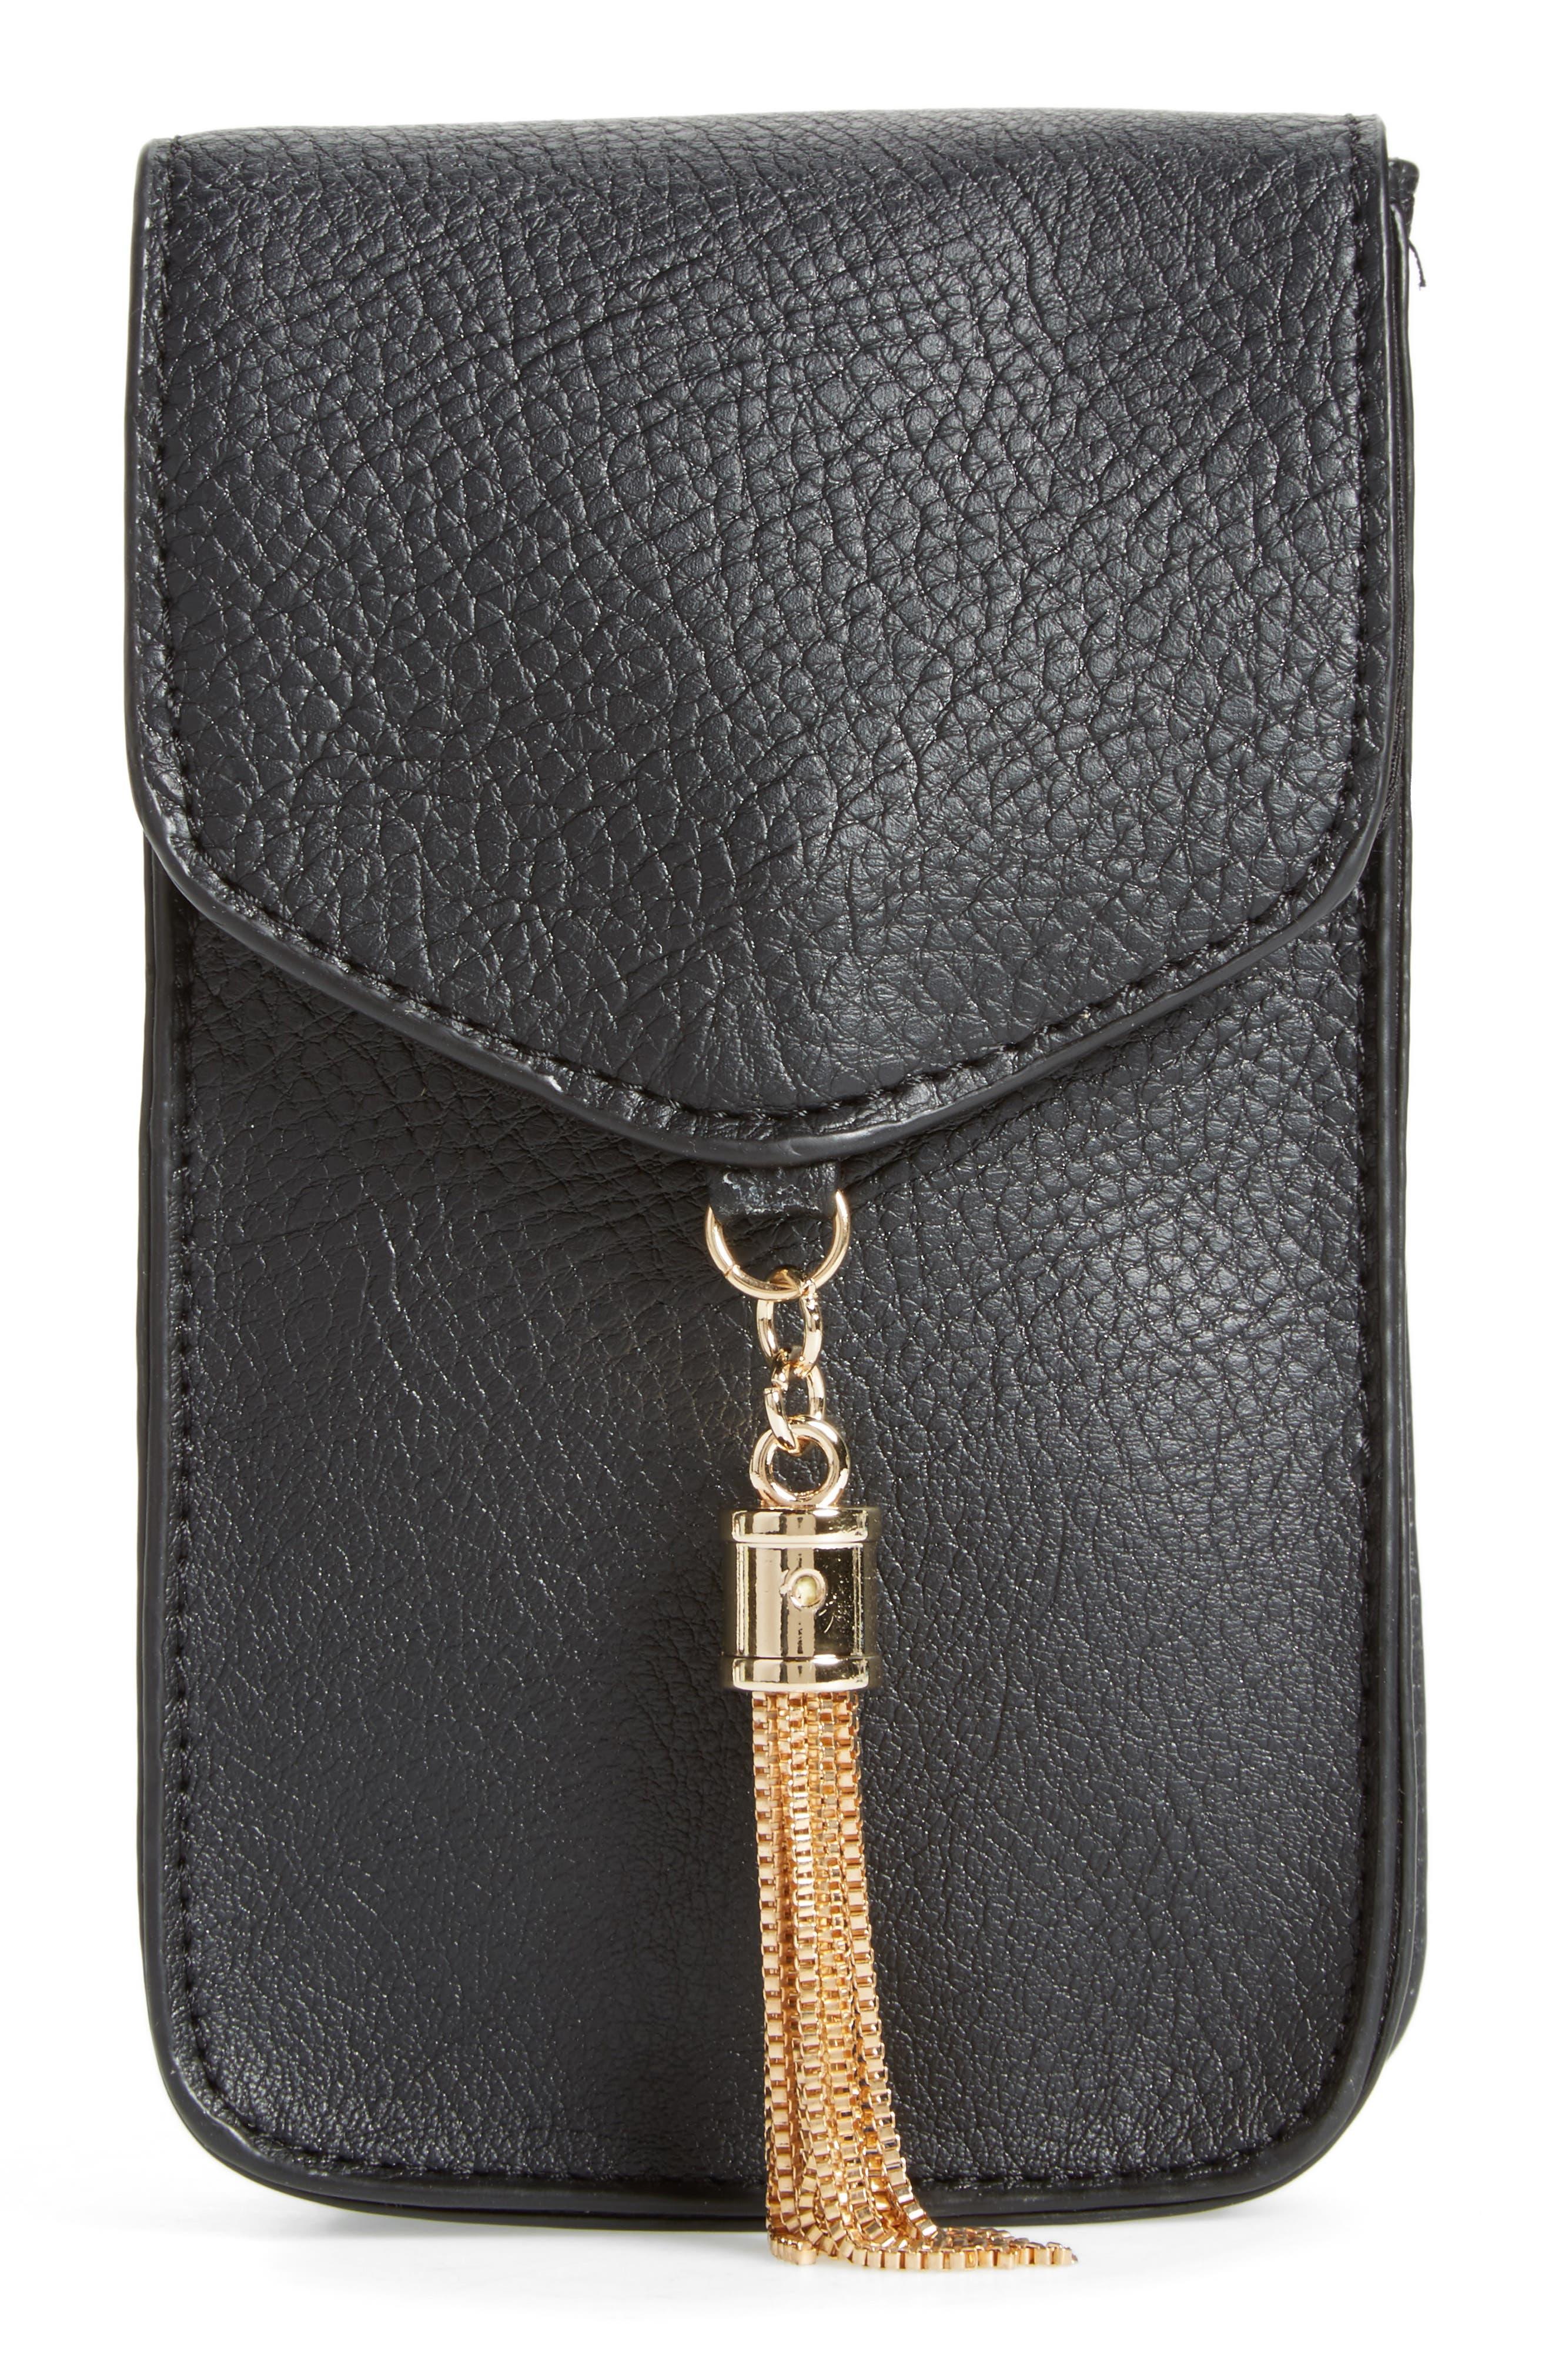 Amici Accessories Tassel Faux Leather Phone Crossbody Bag